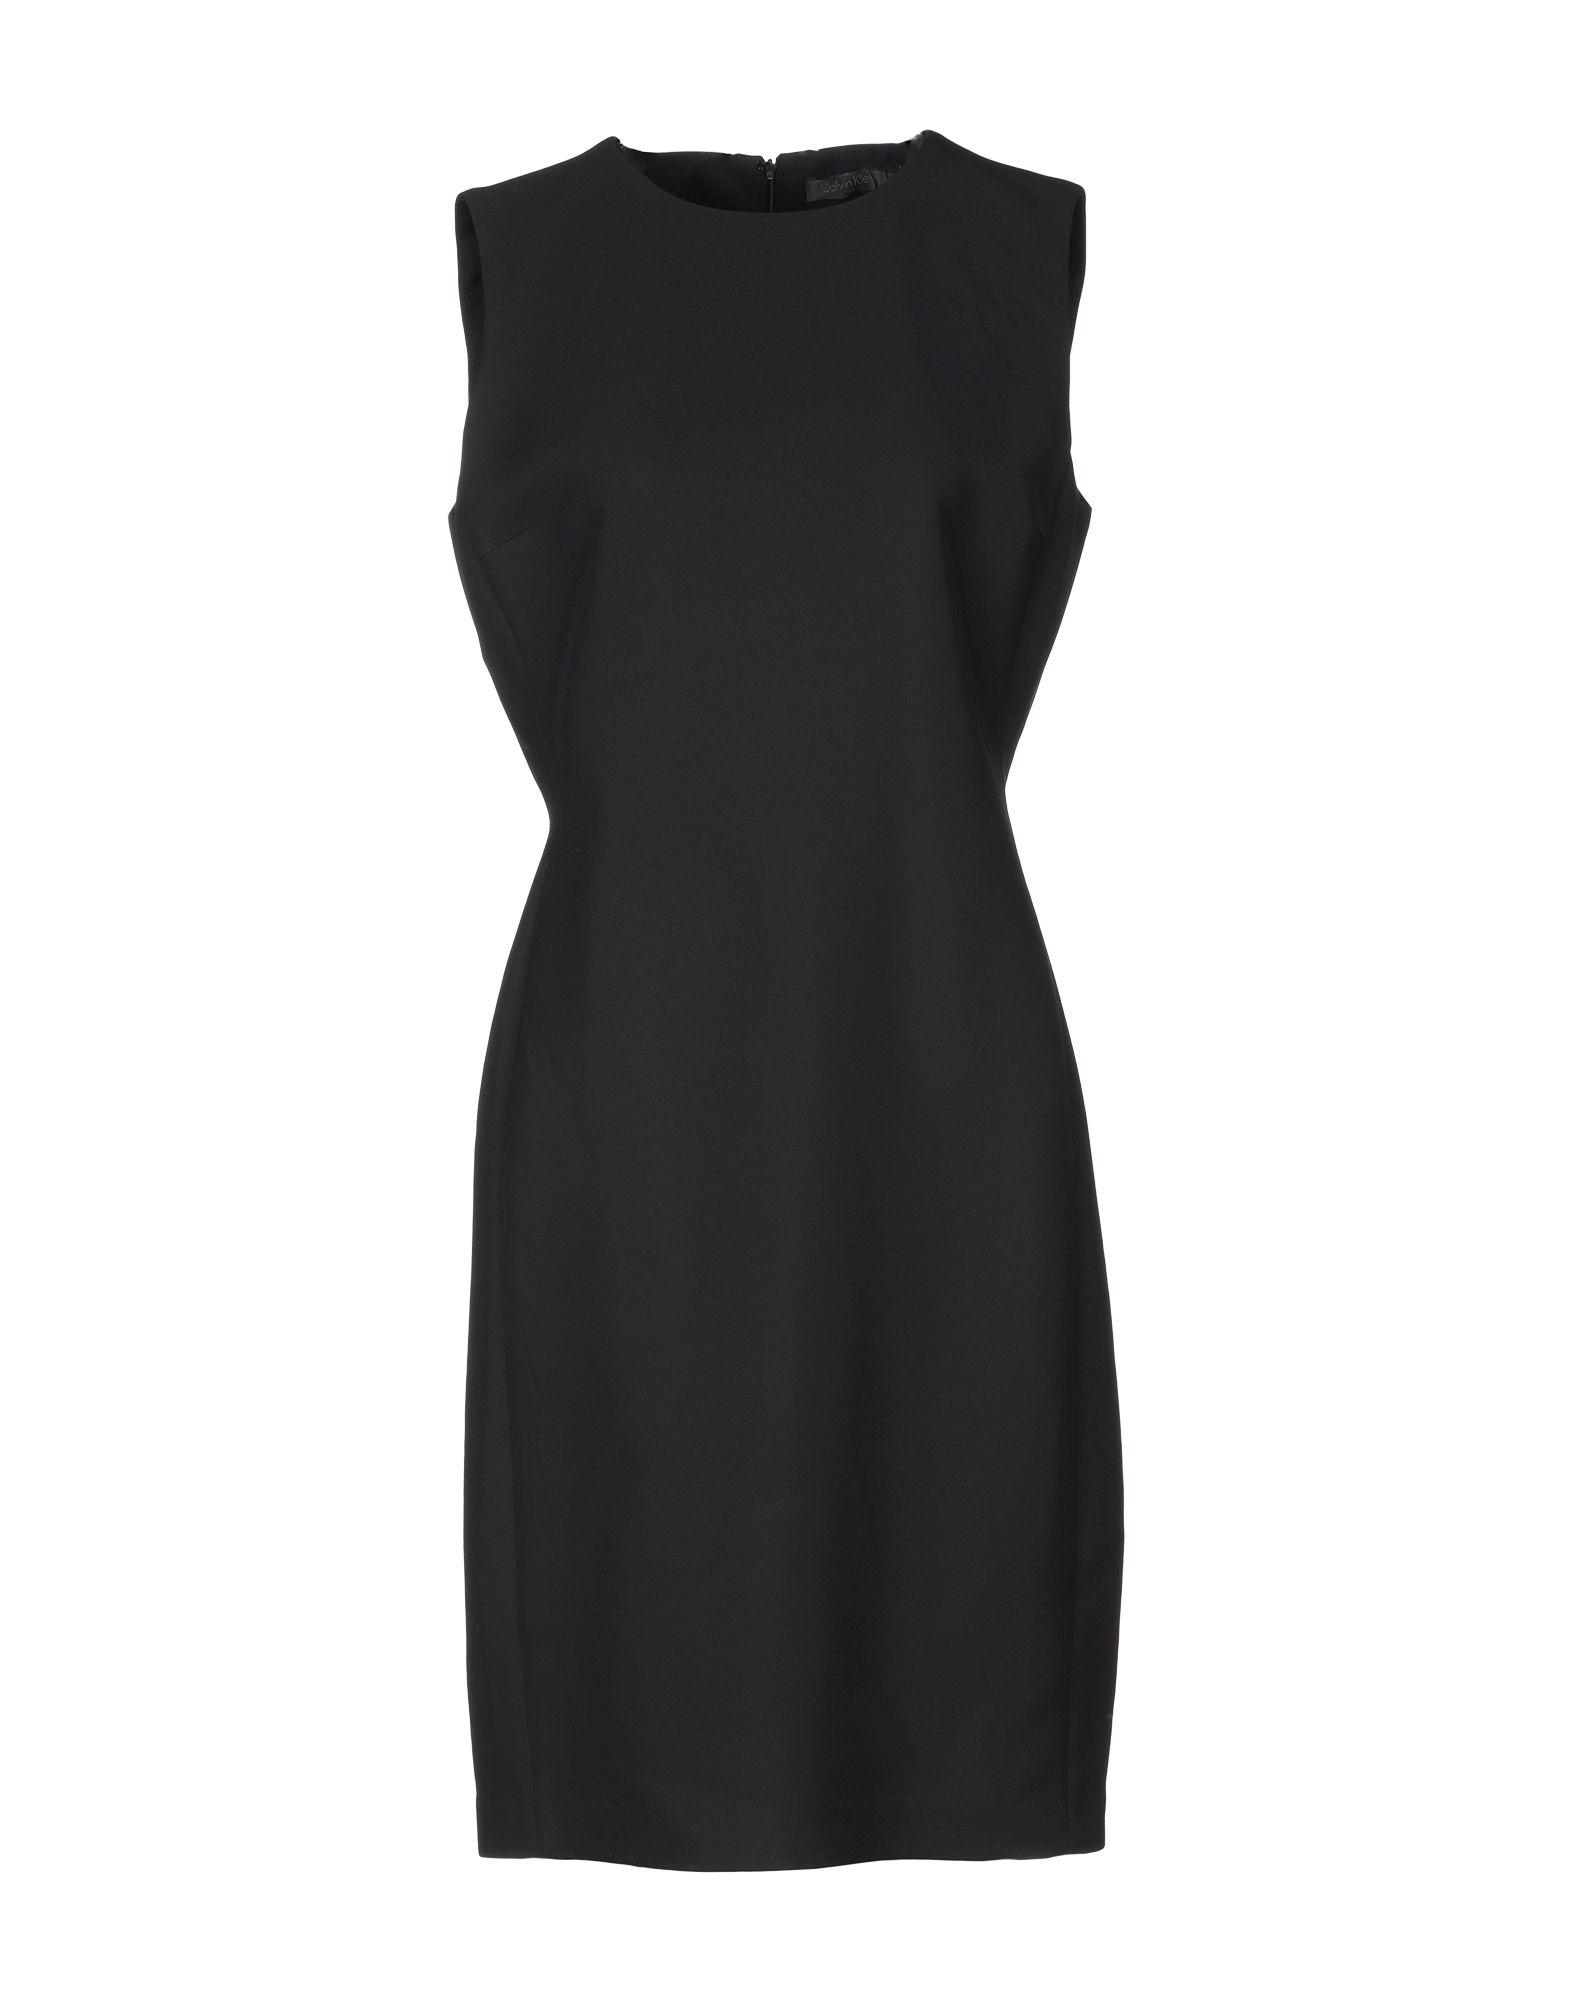 CALVIN KLEIN COLLECTION Платье до колена недорого